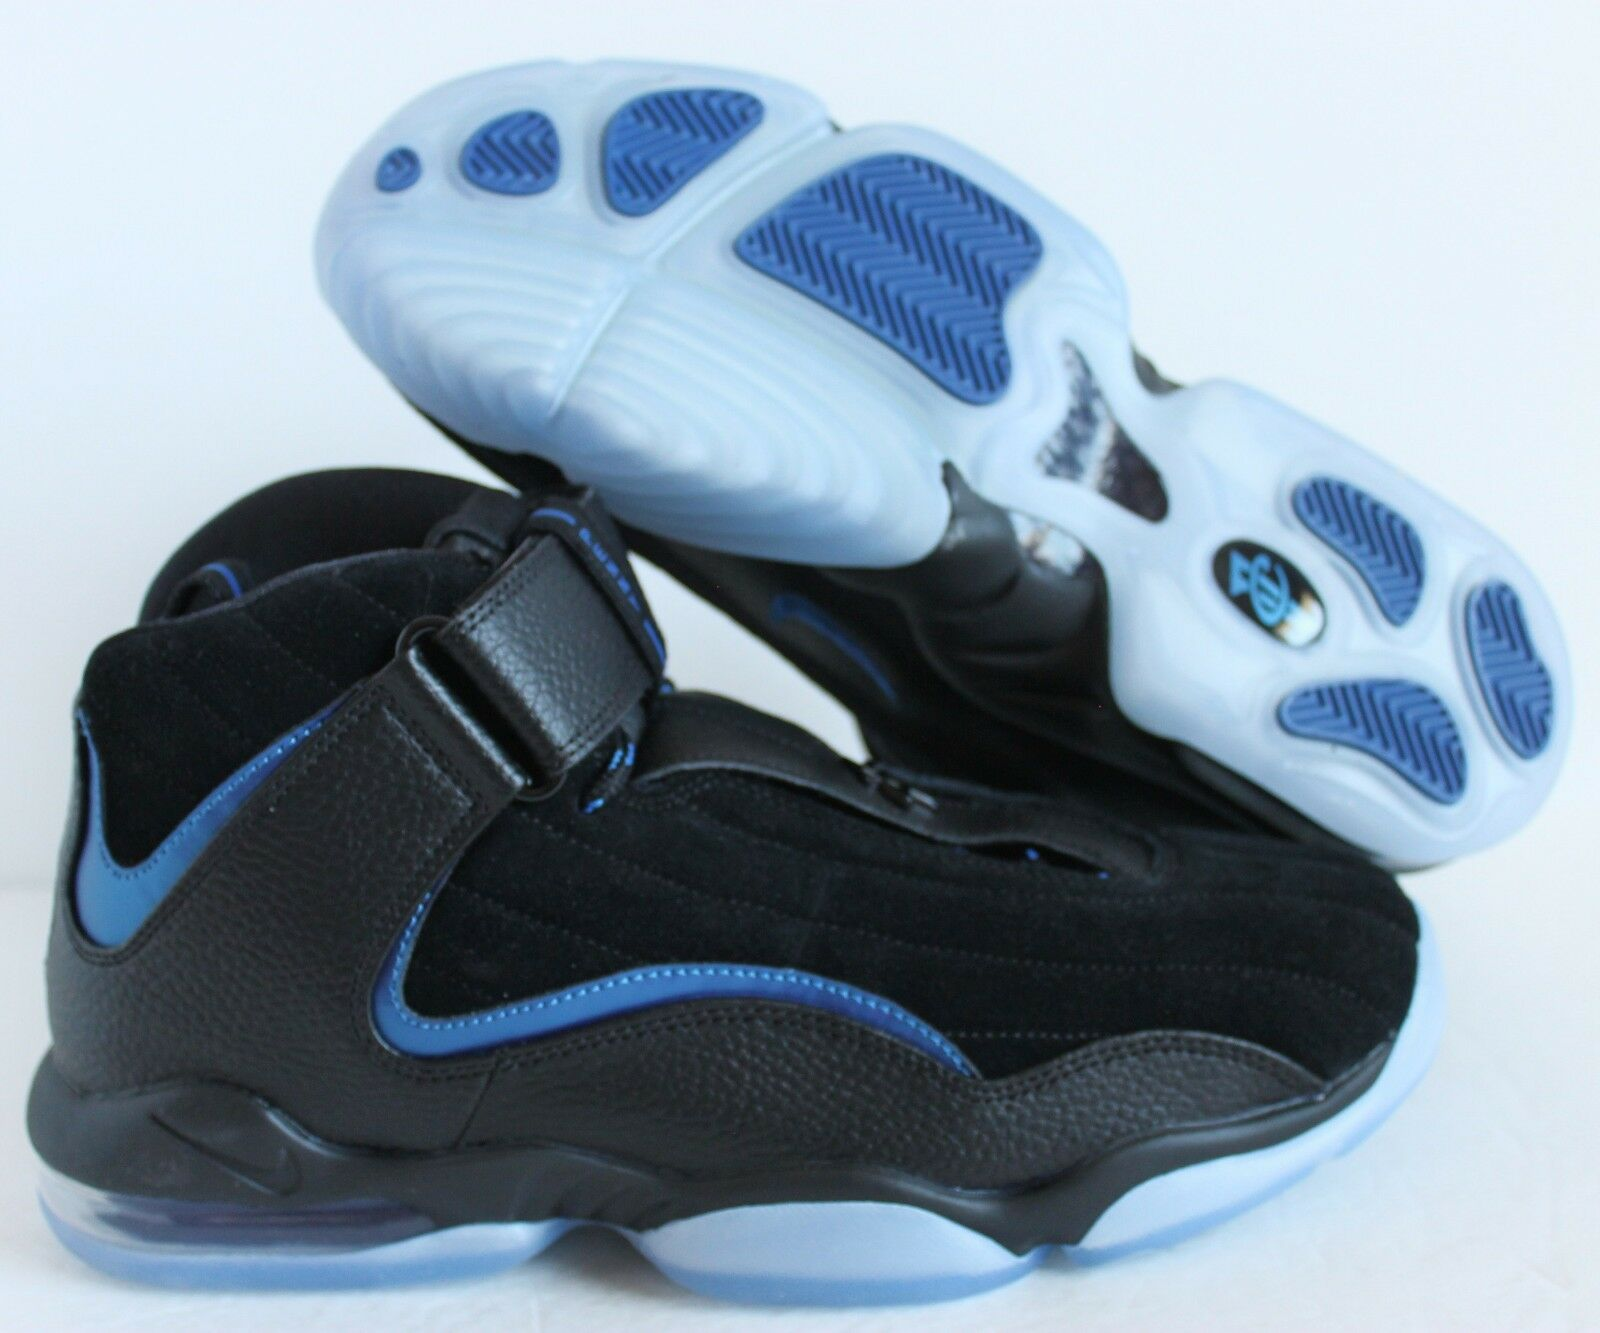 Nike Nike Nike Hombres Air Penny Iv 4 Hardaway Baloncesto Negro-azul [864018-001] 8b649d